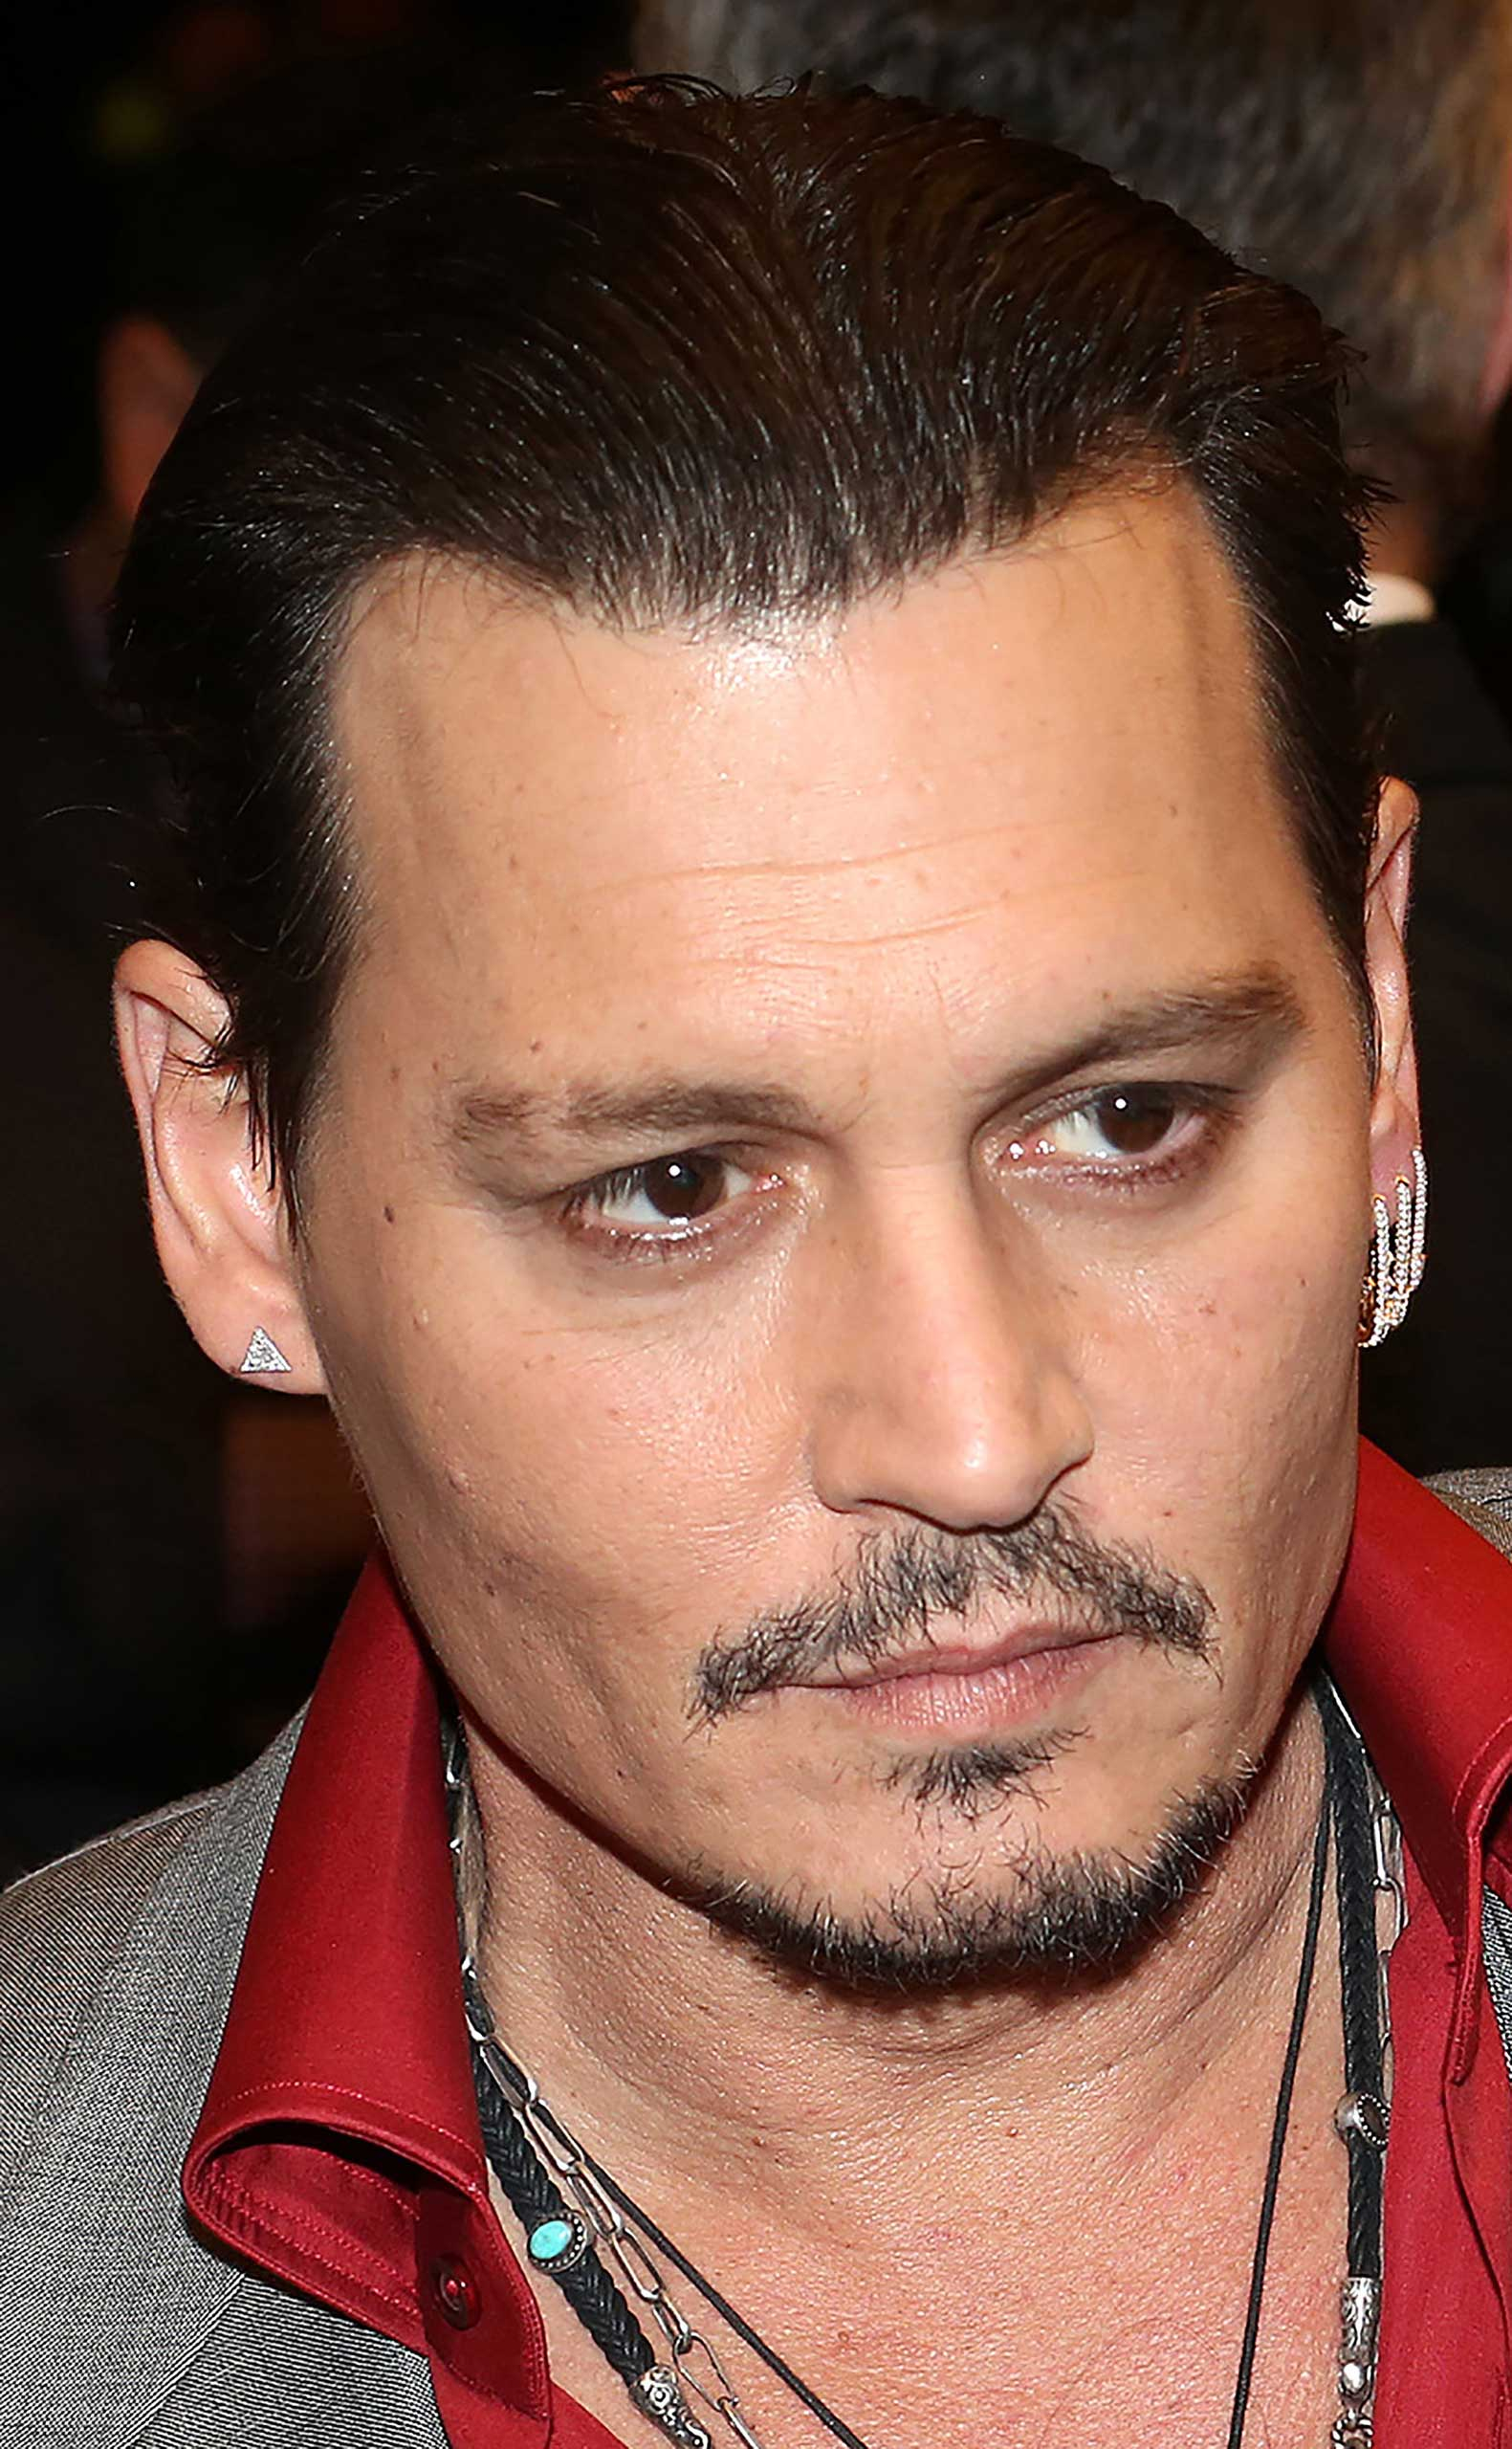 Johnny Depp attends the 'Black Mass' premiere during the 2015 Toronto International Film Festival at The Elgin on September 14, 2015, in Toronto.